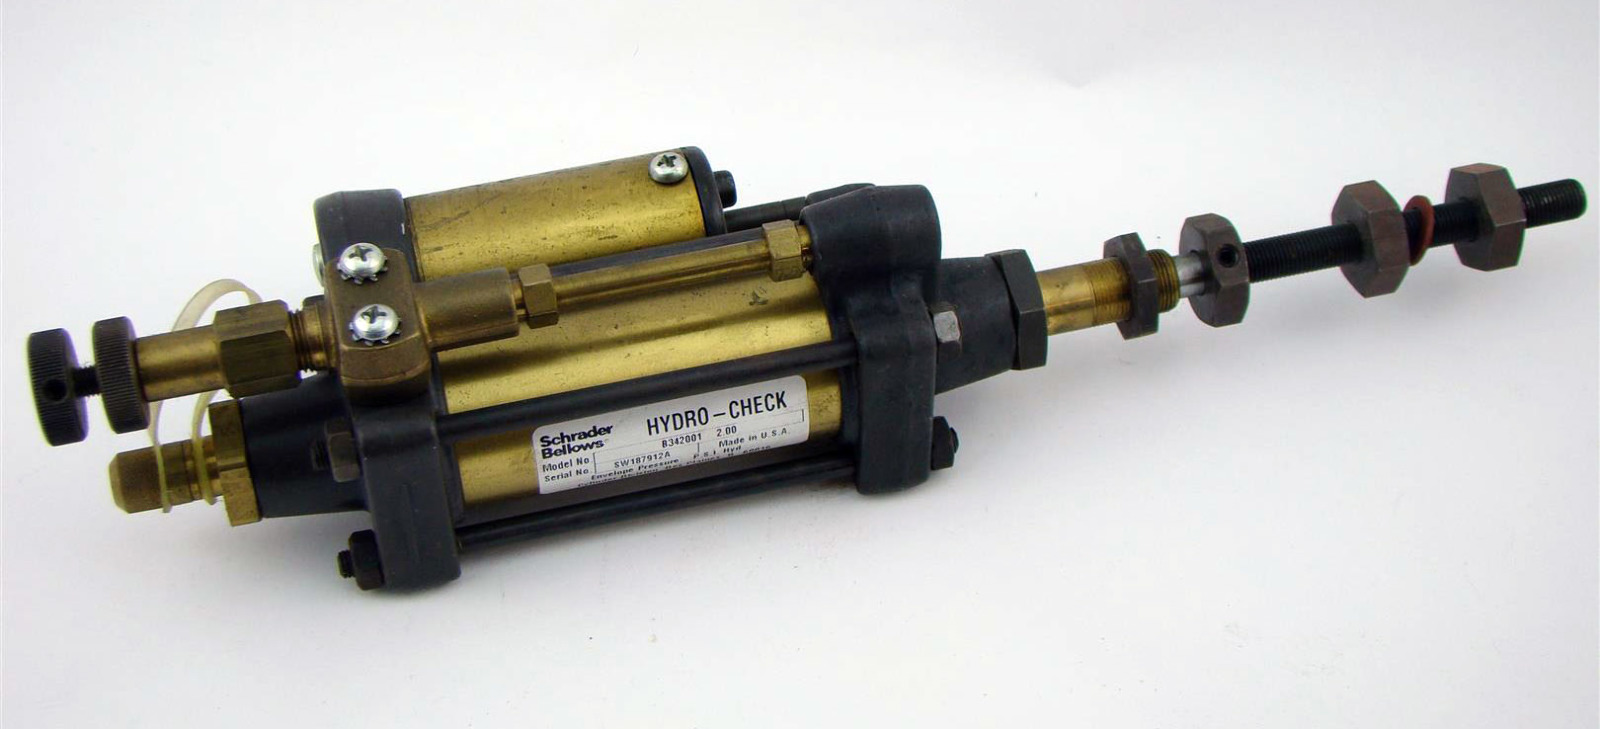 enco milling machine wiring diagram  enco  get free image